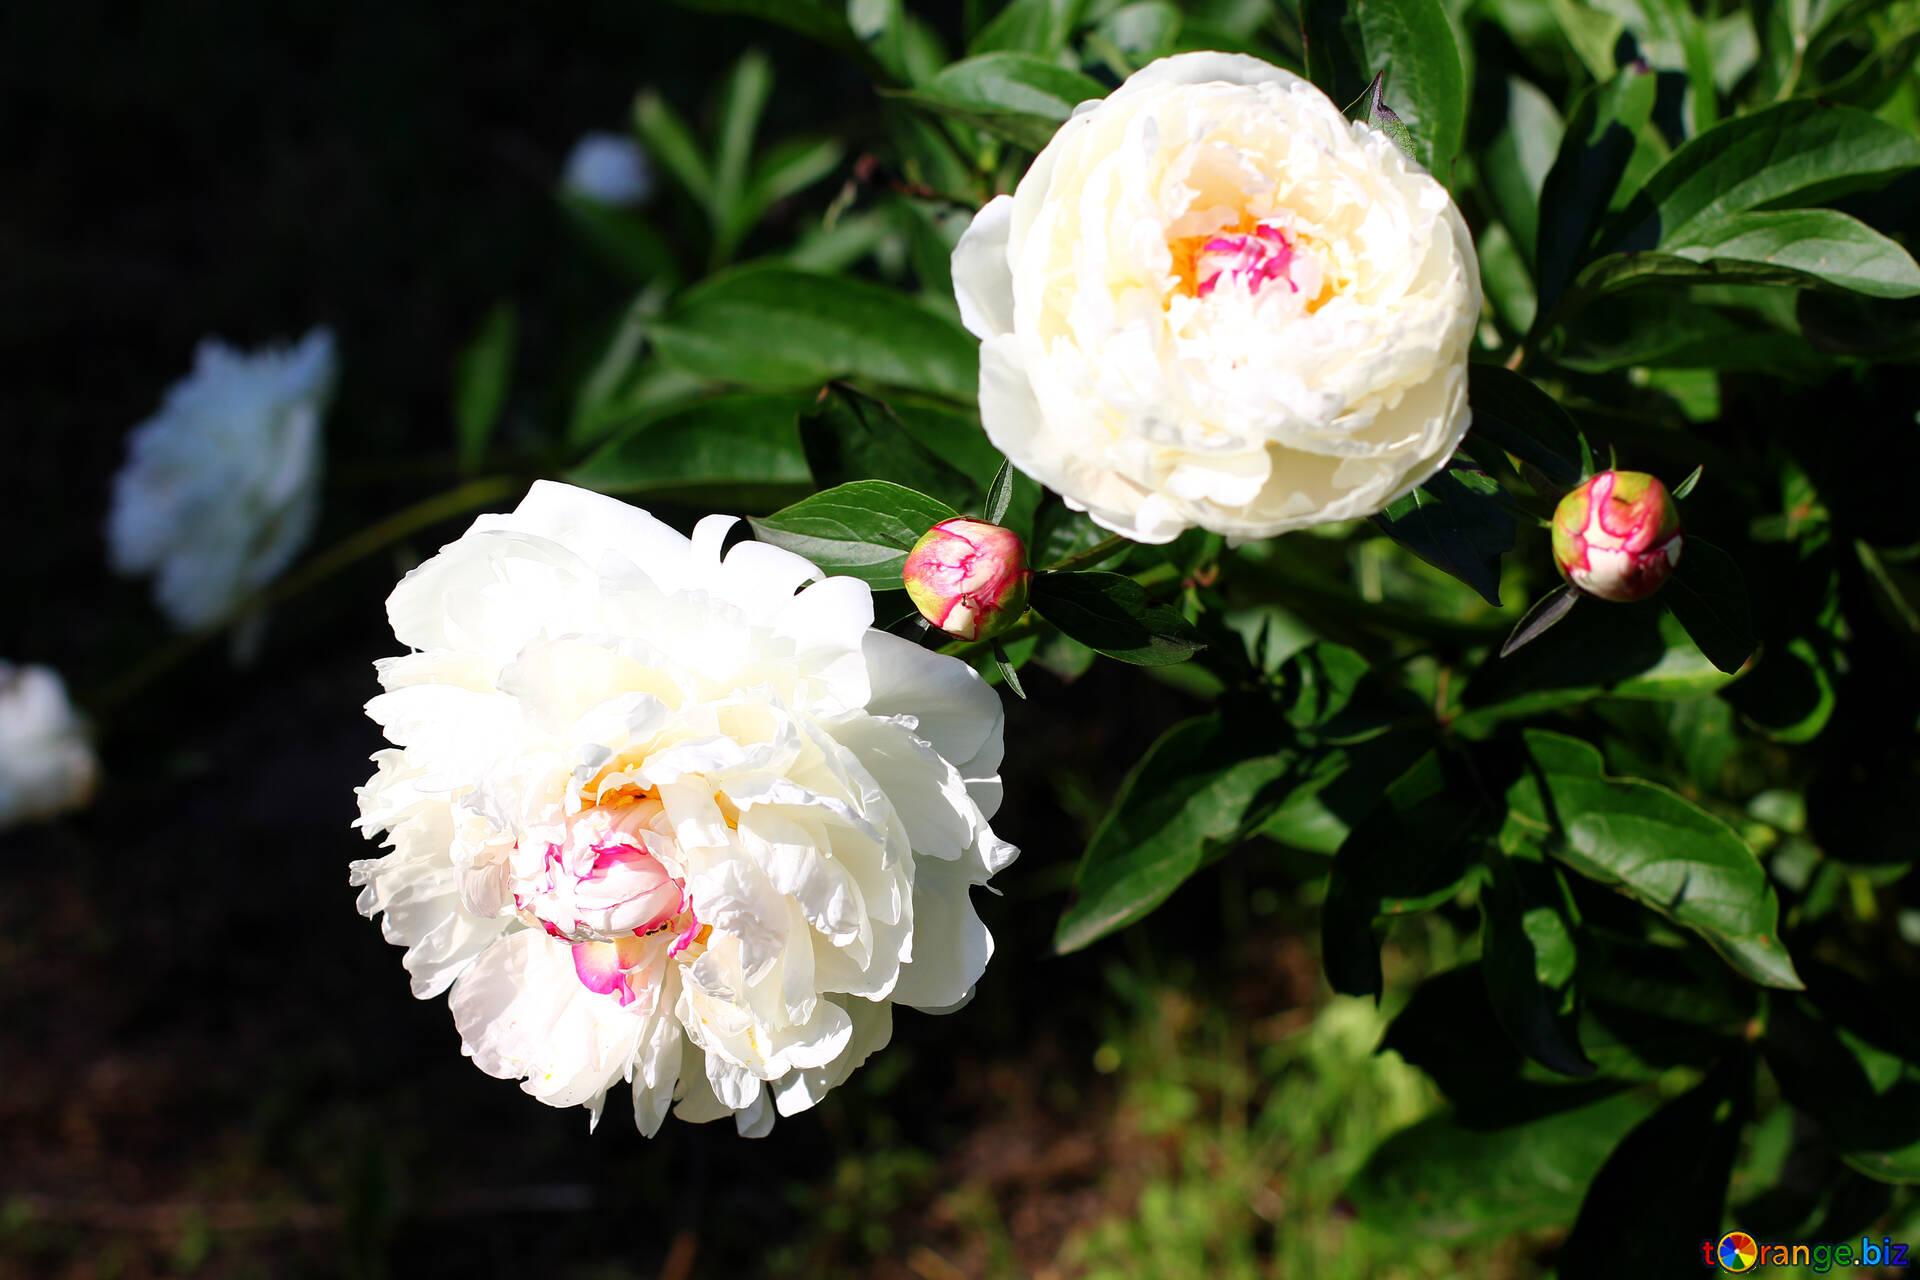 Flowers Peonies White Peonies On Bush Village 32648